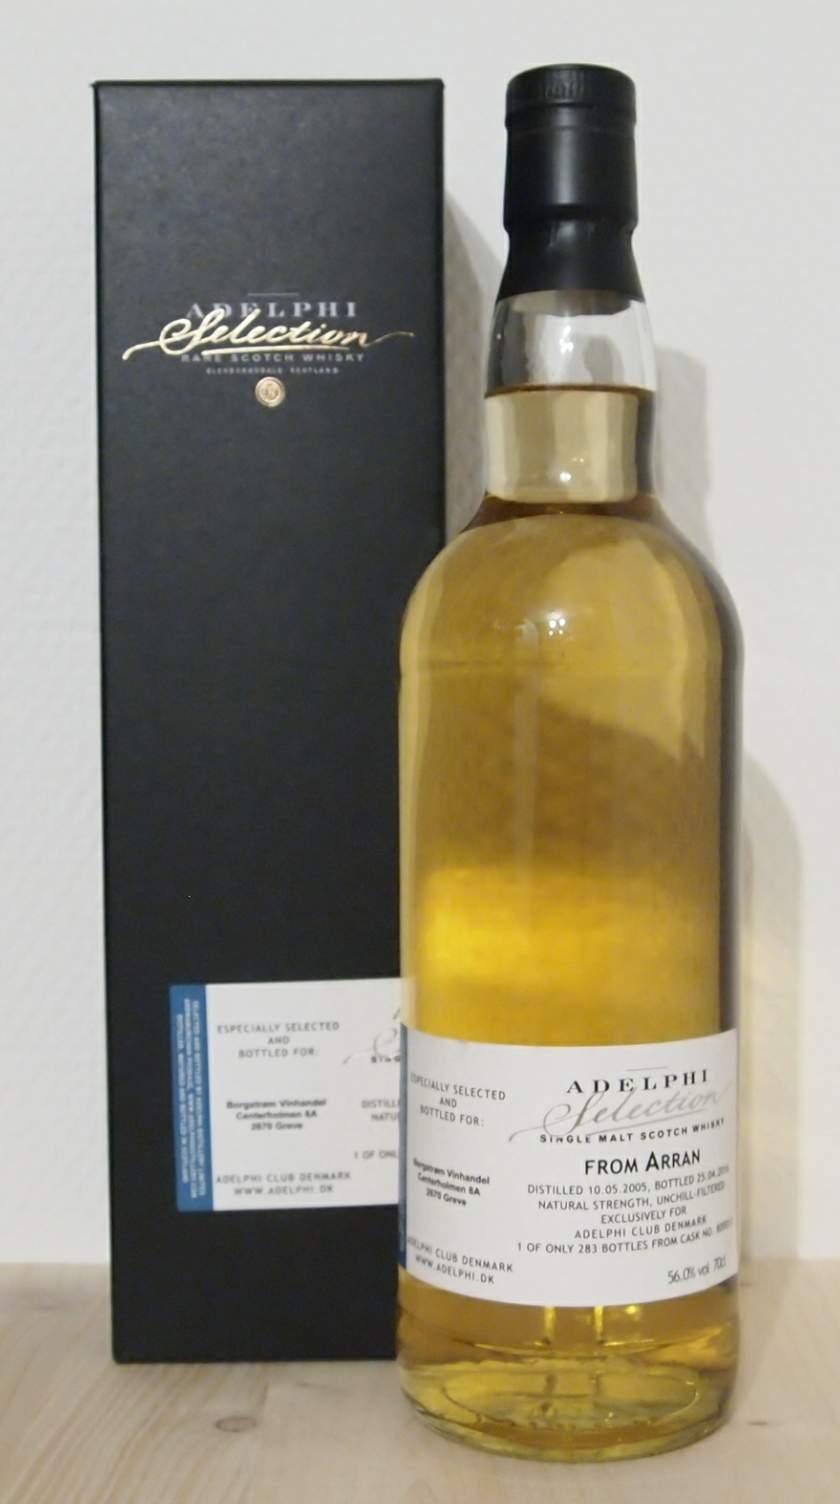 Single Malt Whisky Arran 10yo, Adelphi Club Denmark, Cask 800013, 2005